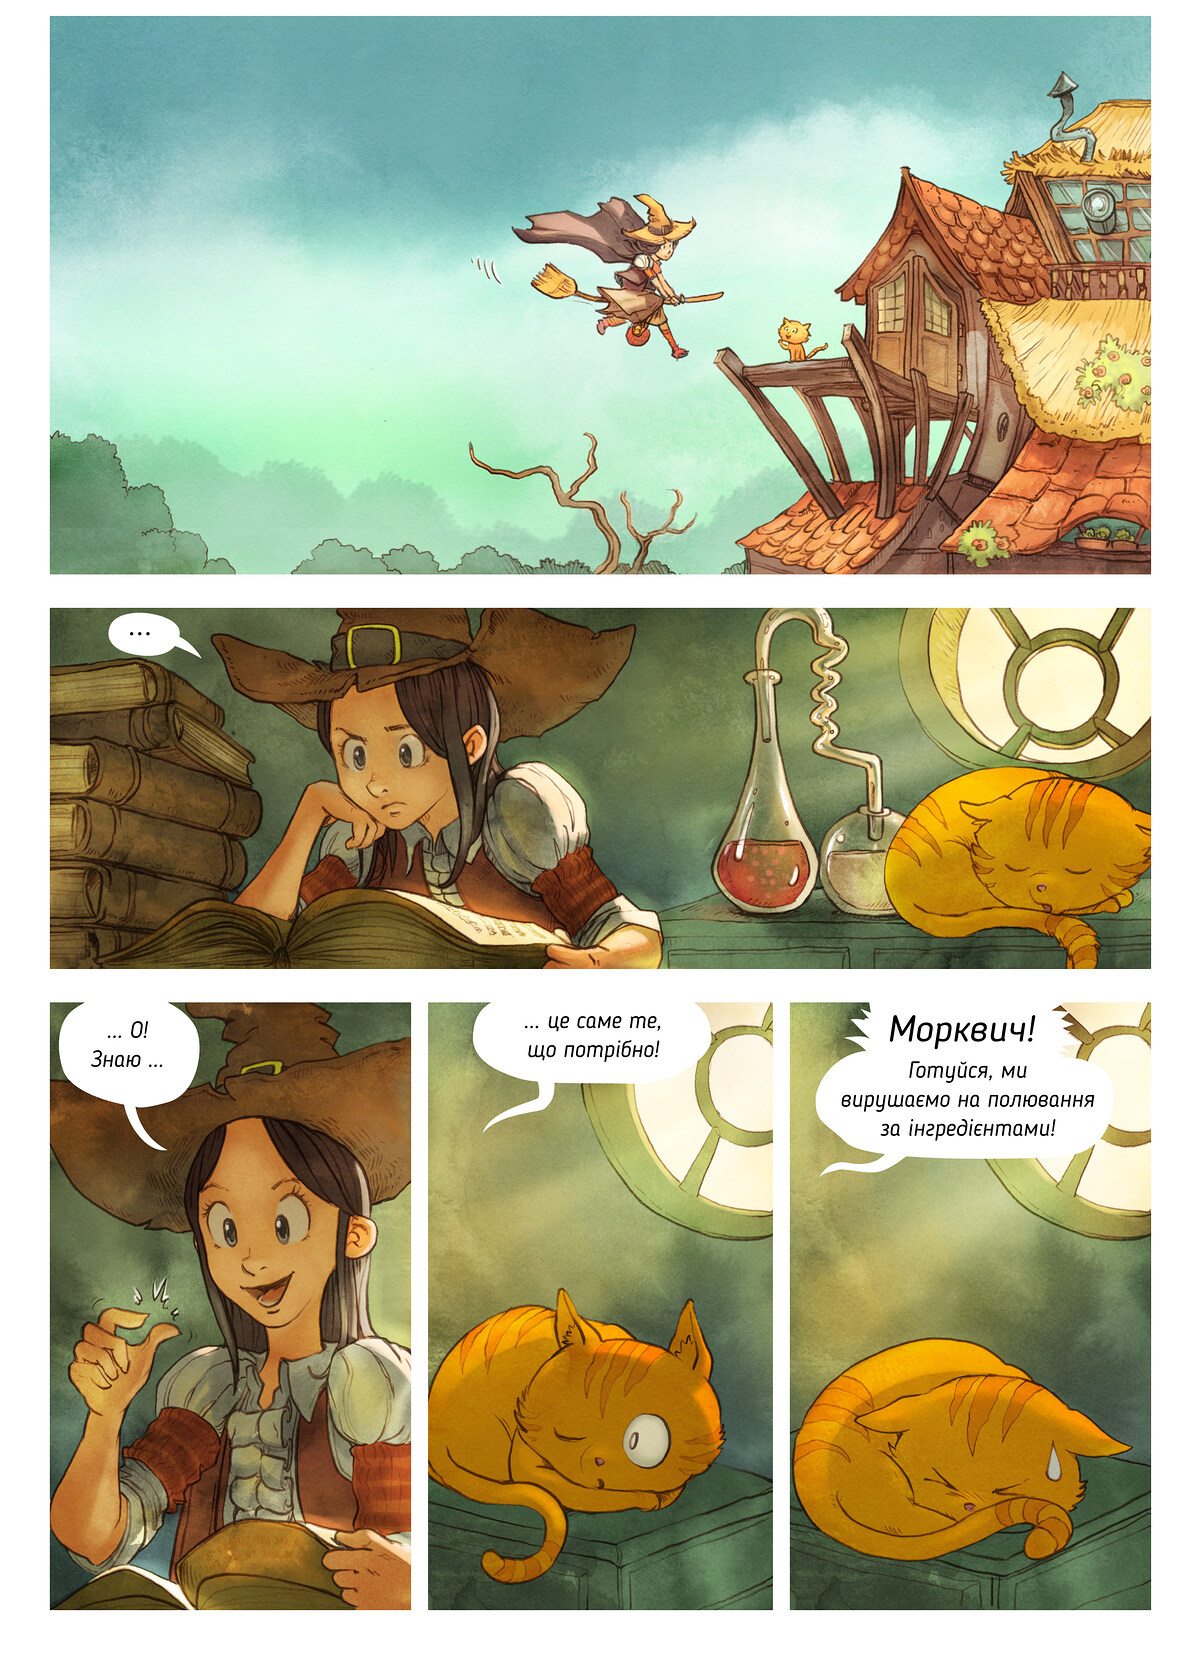 A webcomic page of Pepper&Carrot, епізод 3 [uk], стор. 4